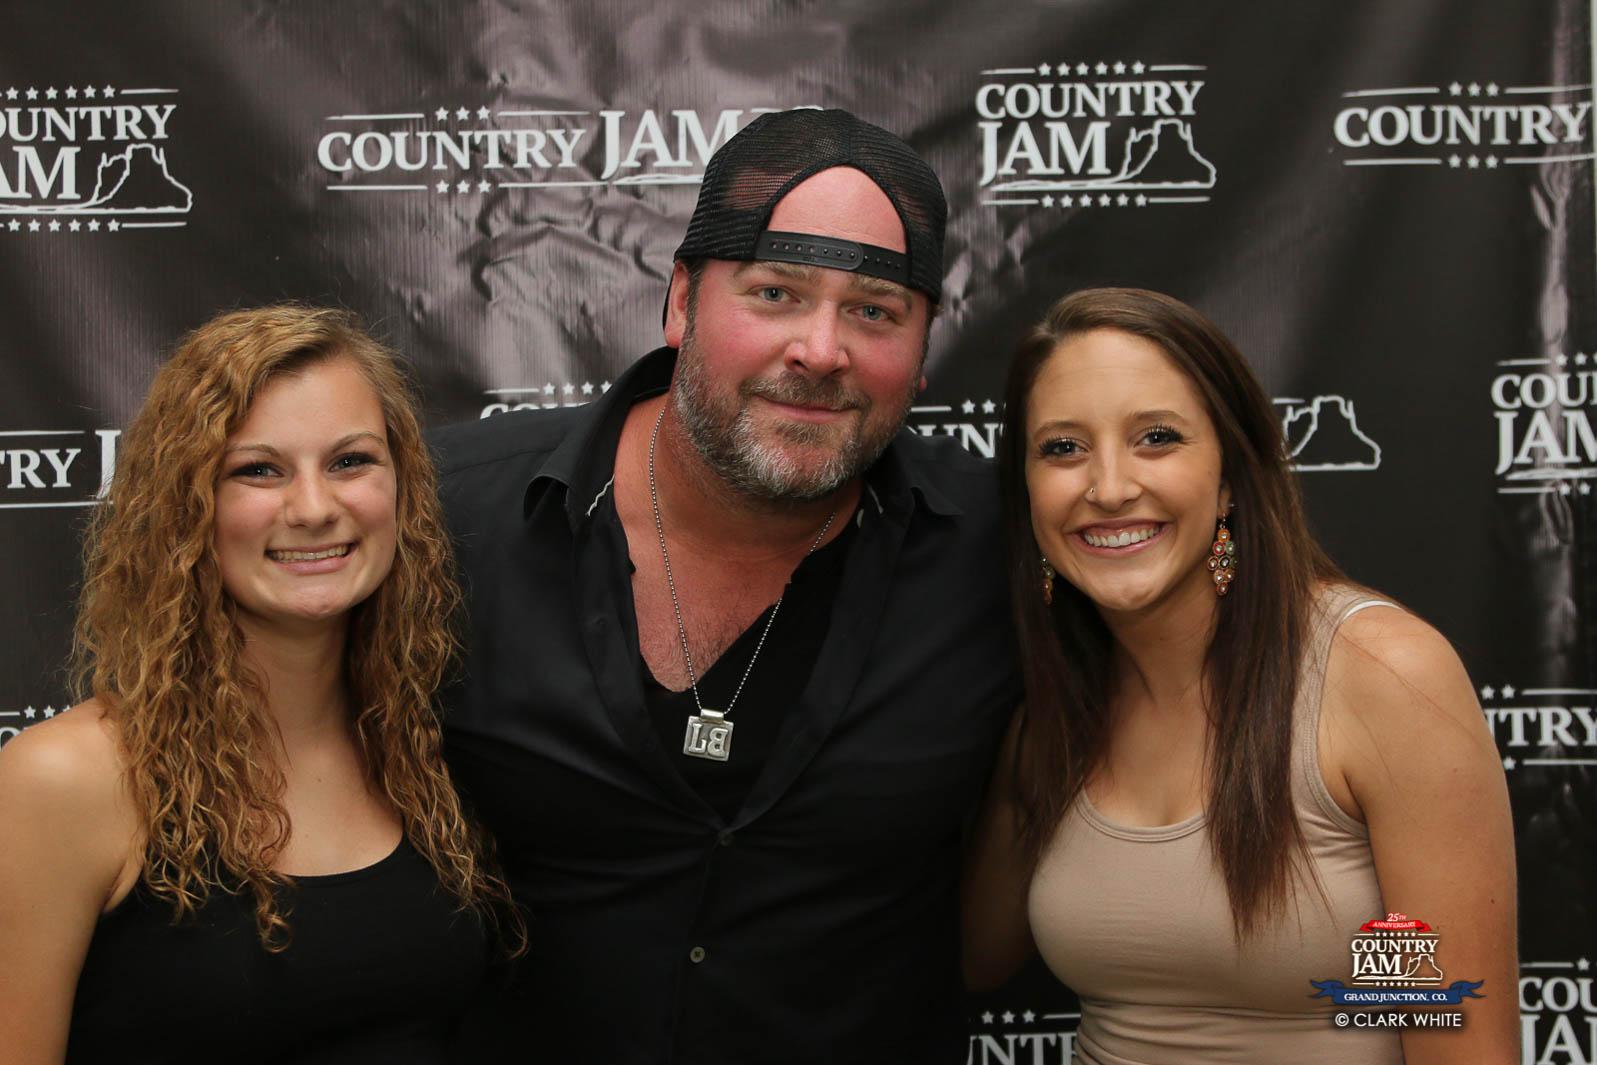 Lee Brice Meet Greet Photos At Country Jam 2016 Country Jam